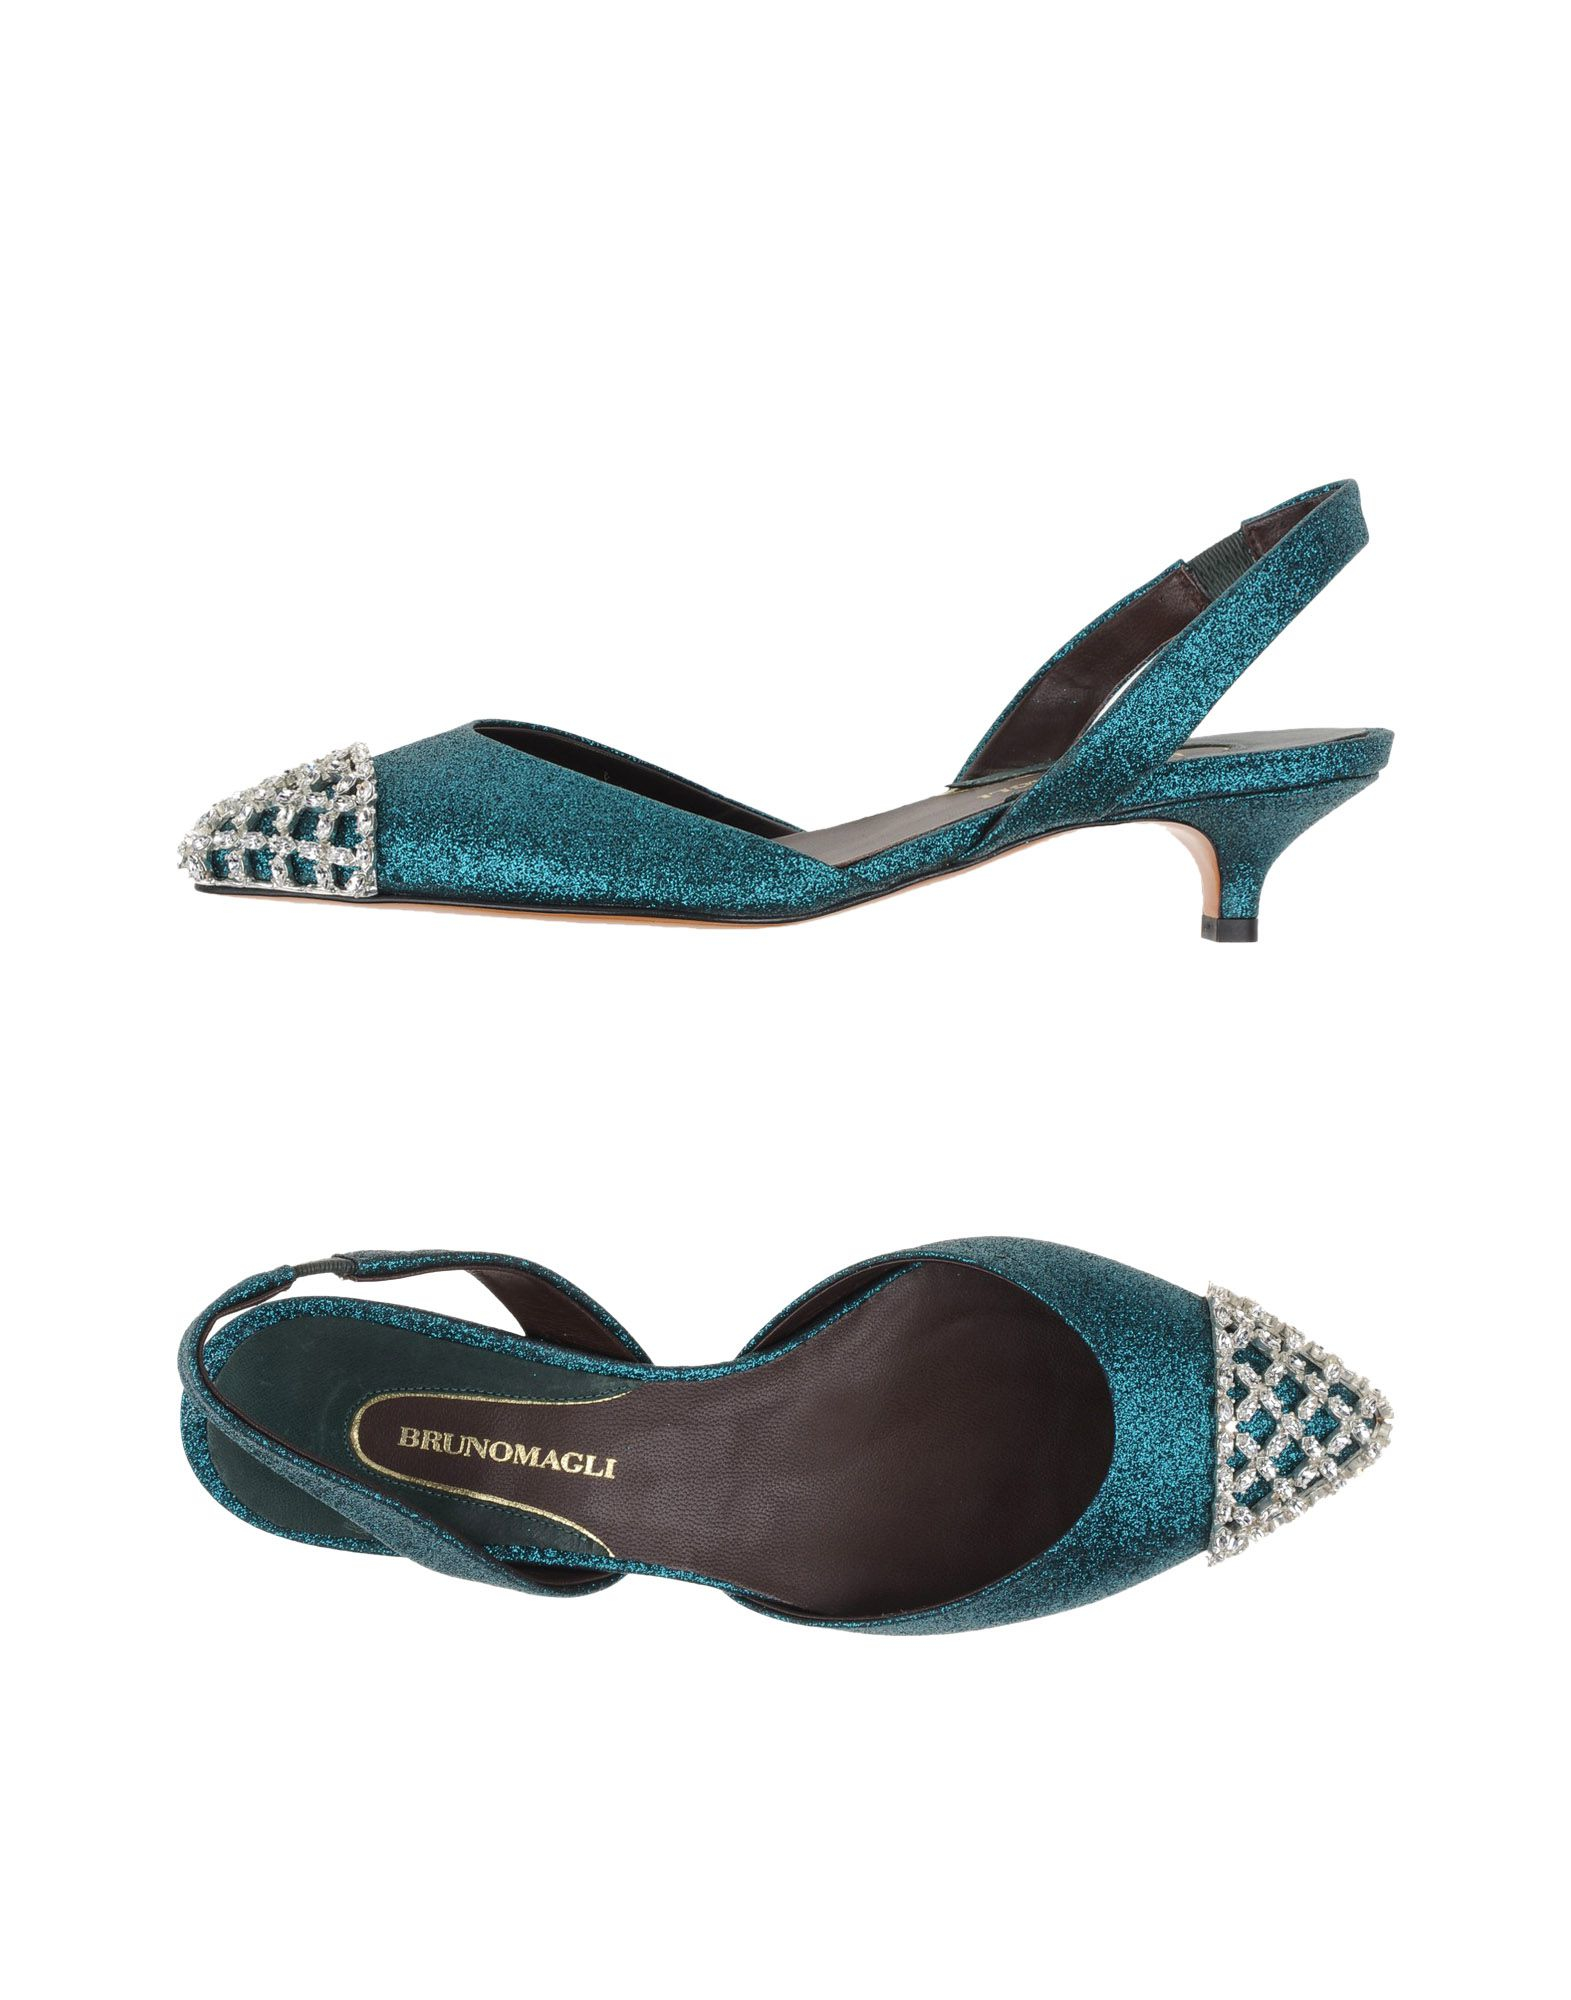 Bruno Magli Womens Shoes